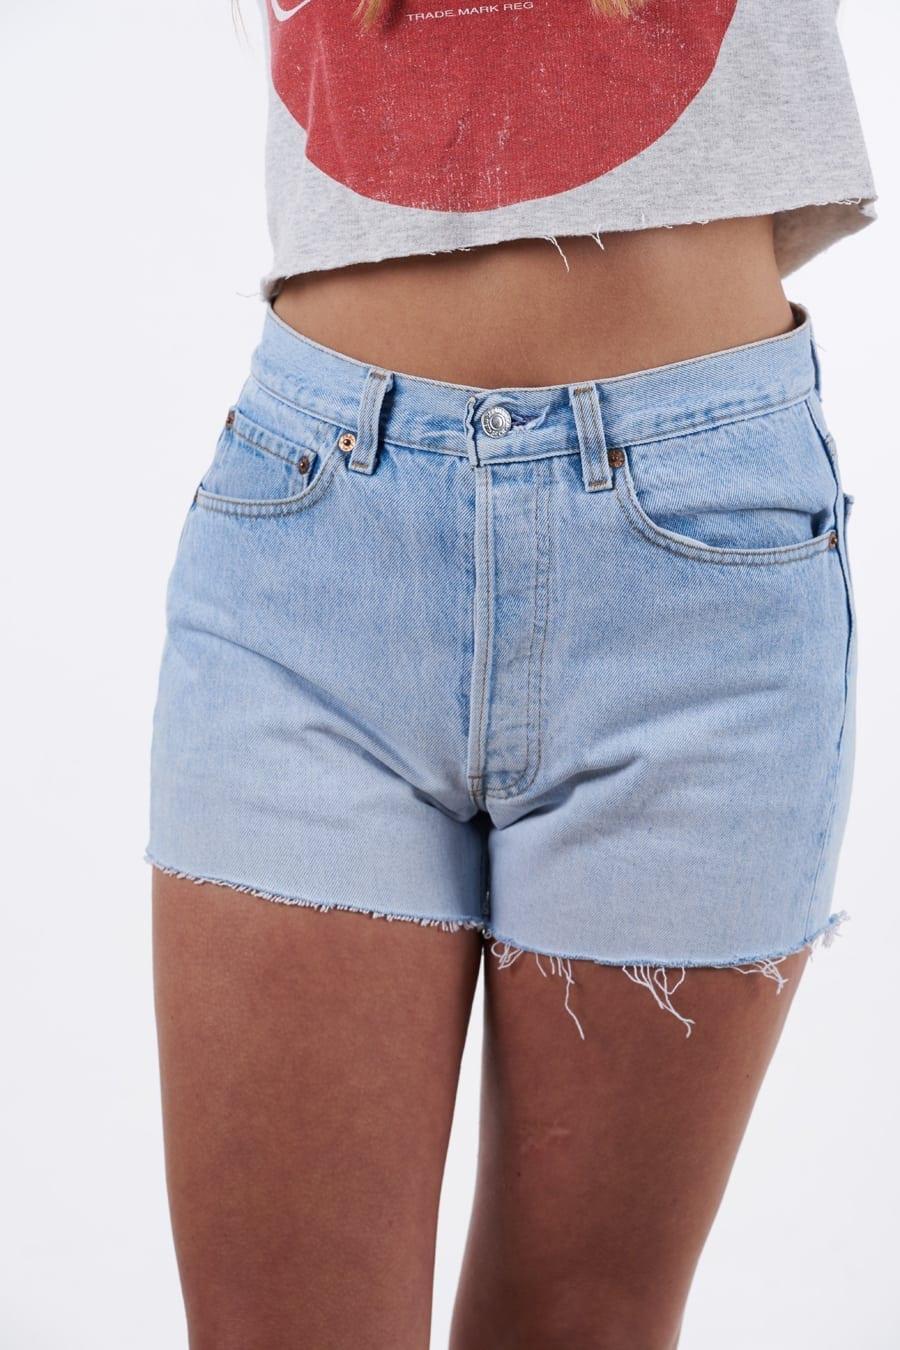 Women's Levi's denim shorts